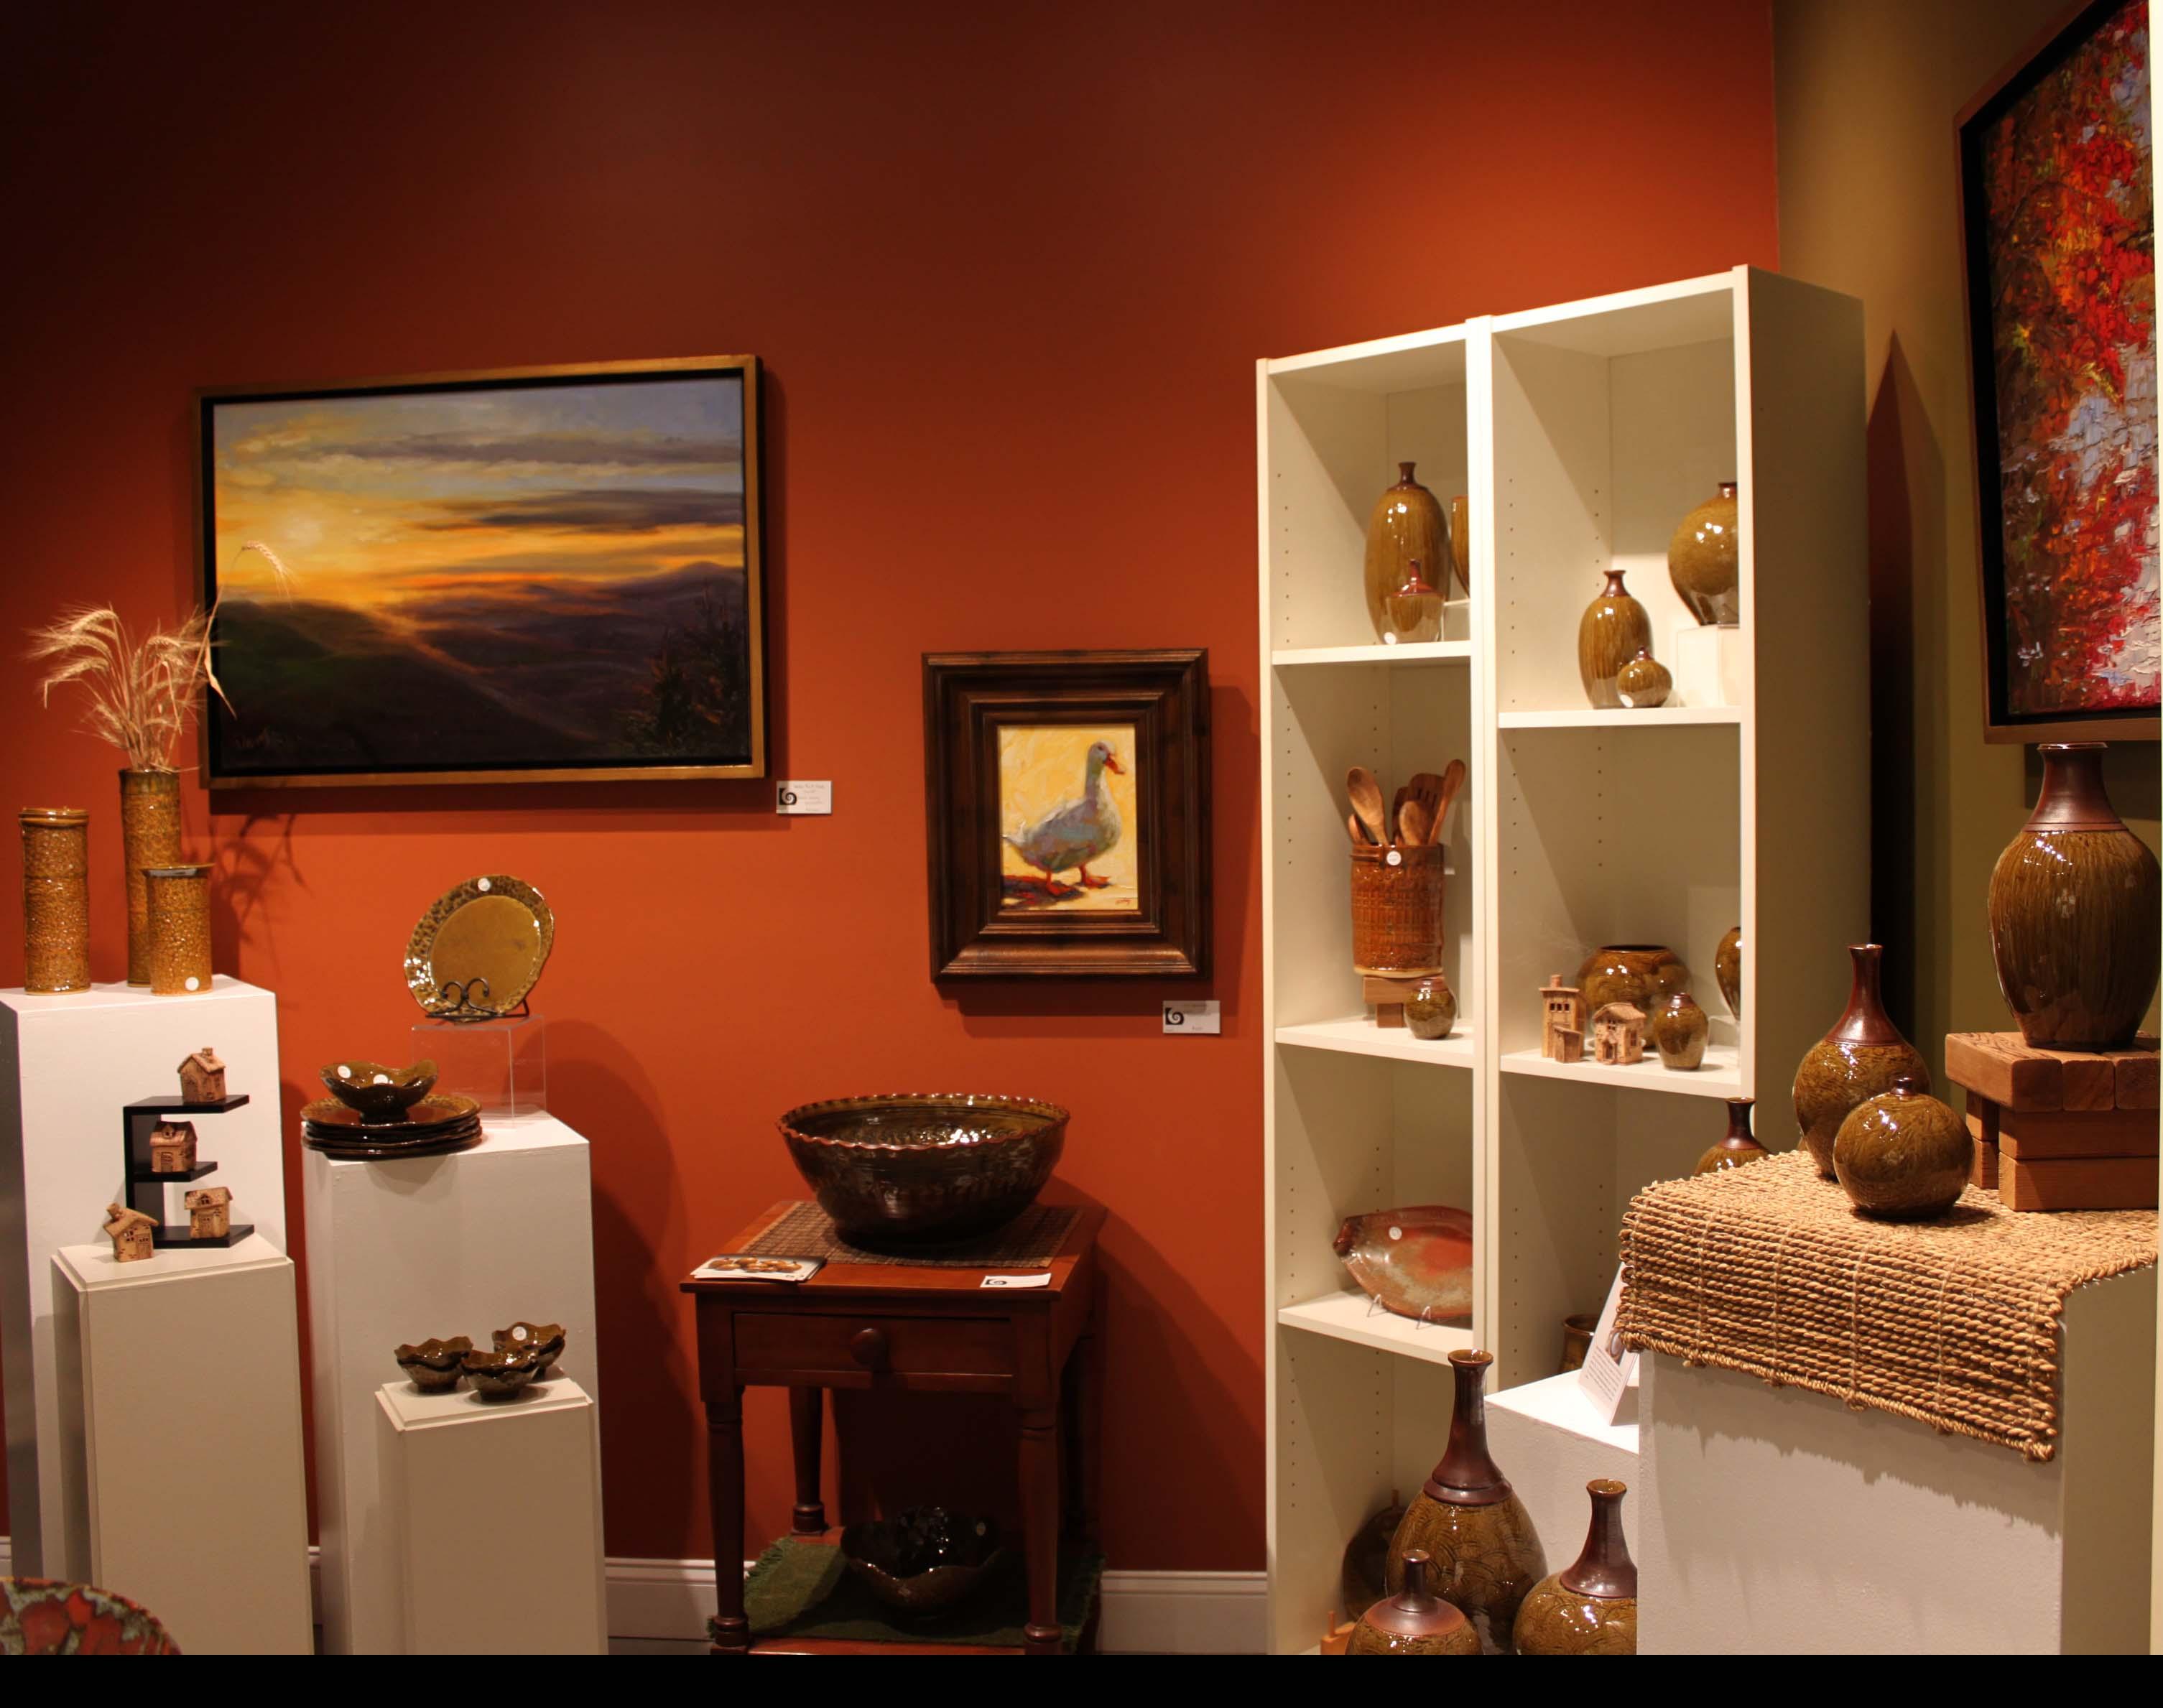 the village potters, asheville, nc, pottery, ceramics, feature gallery, karen dubois, lori theriault